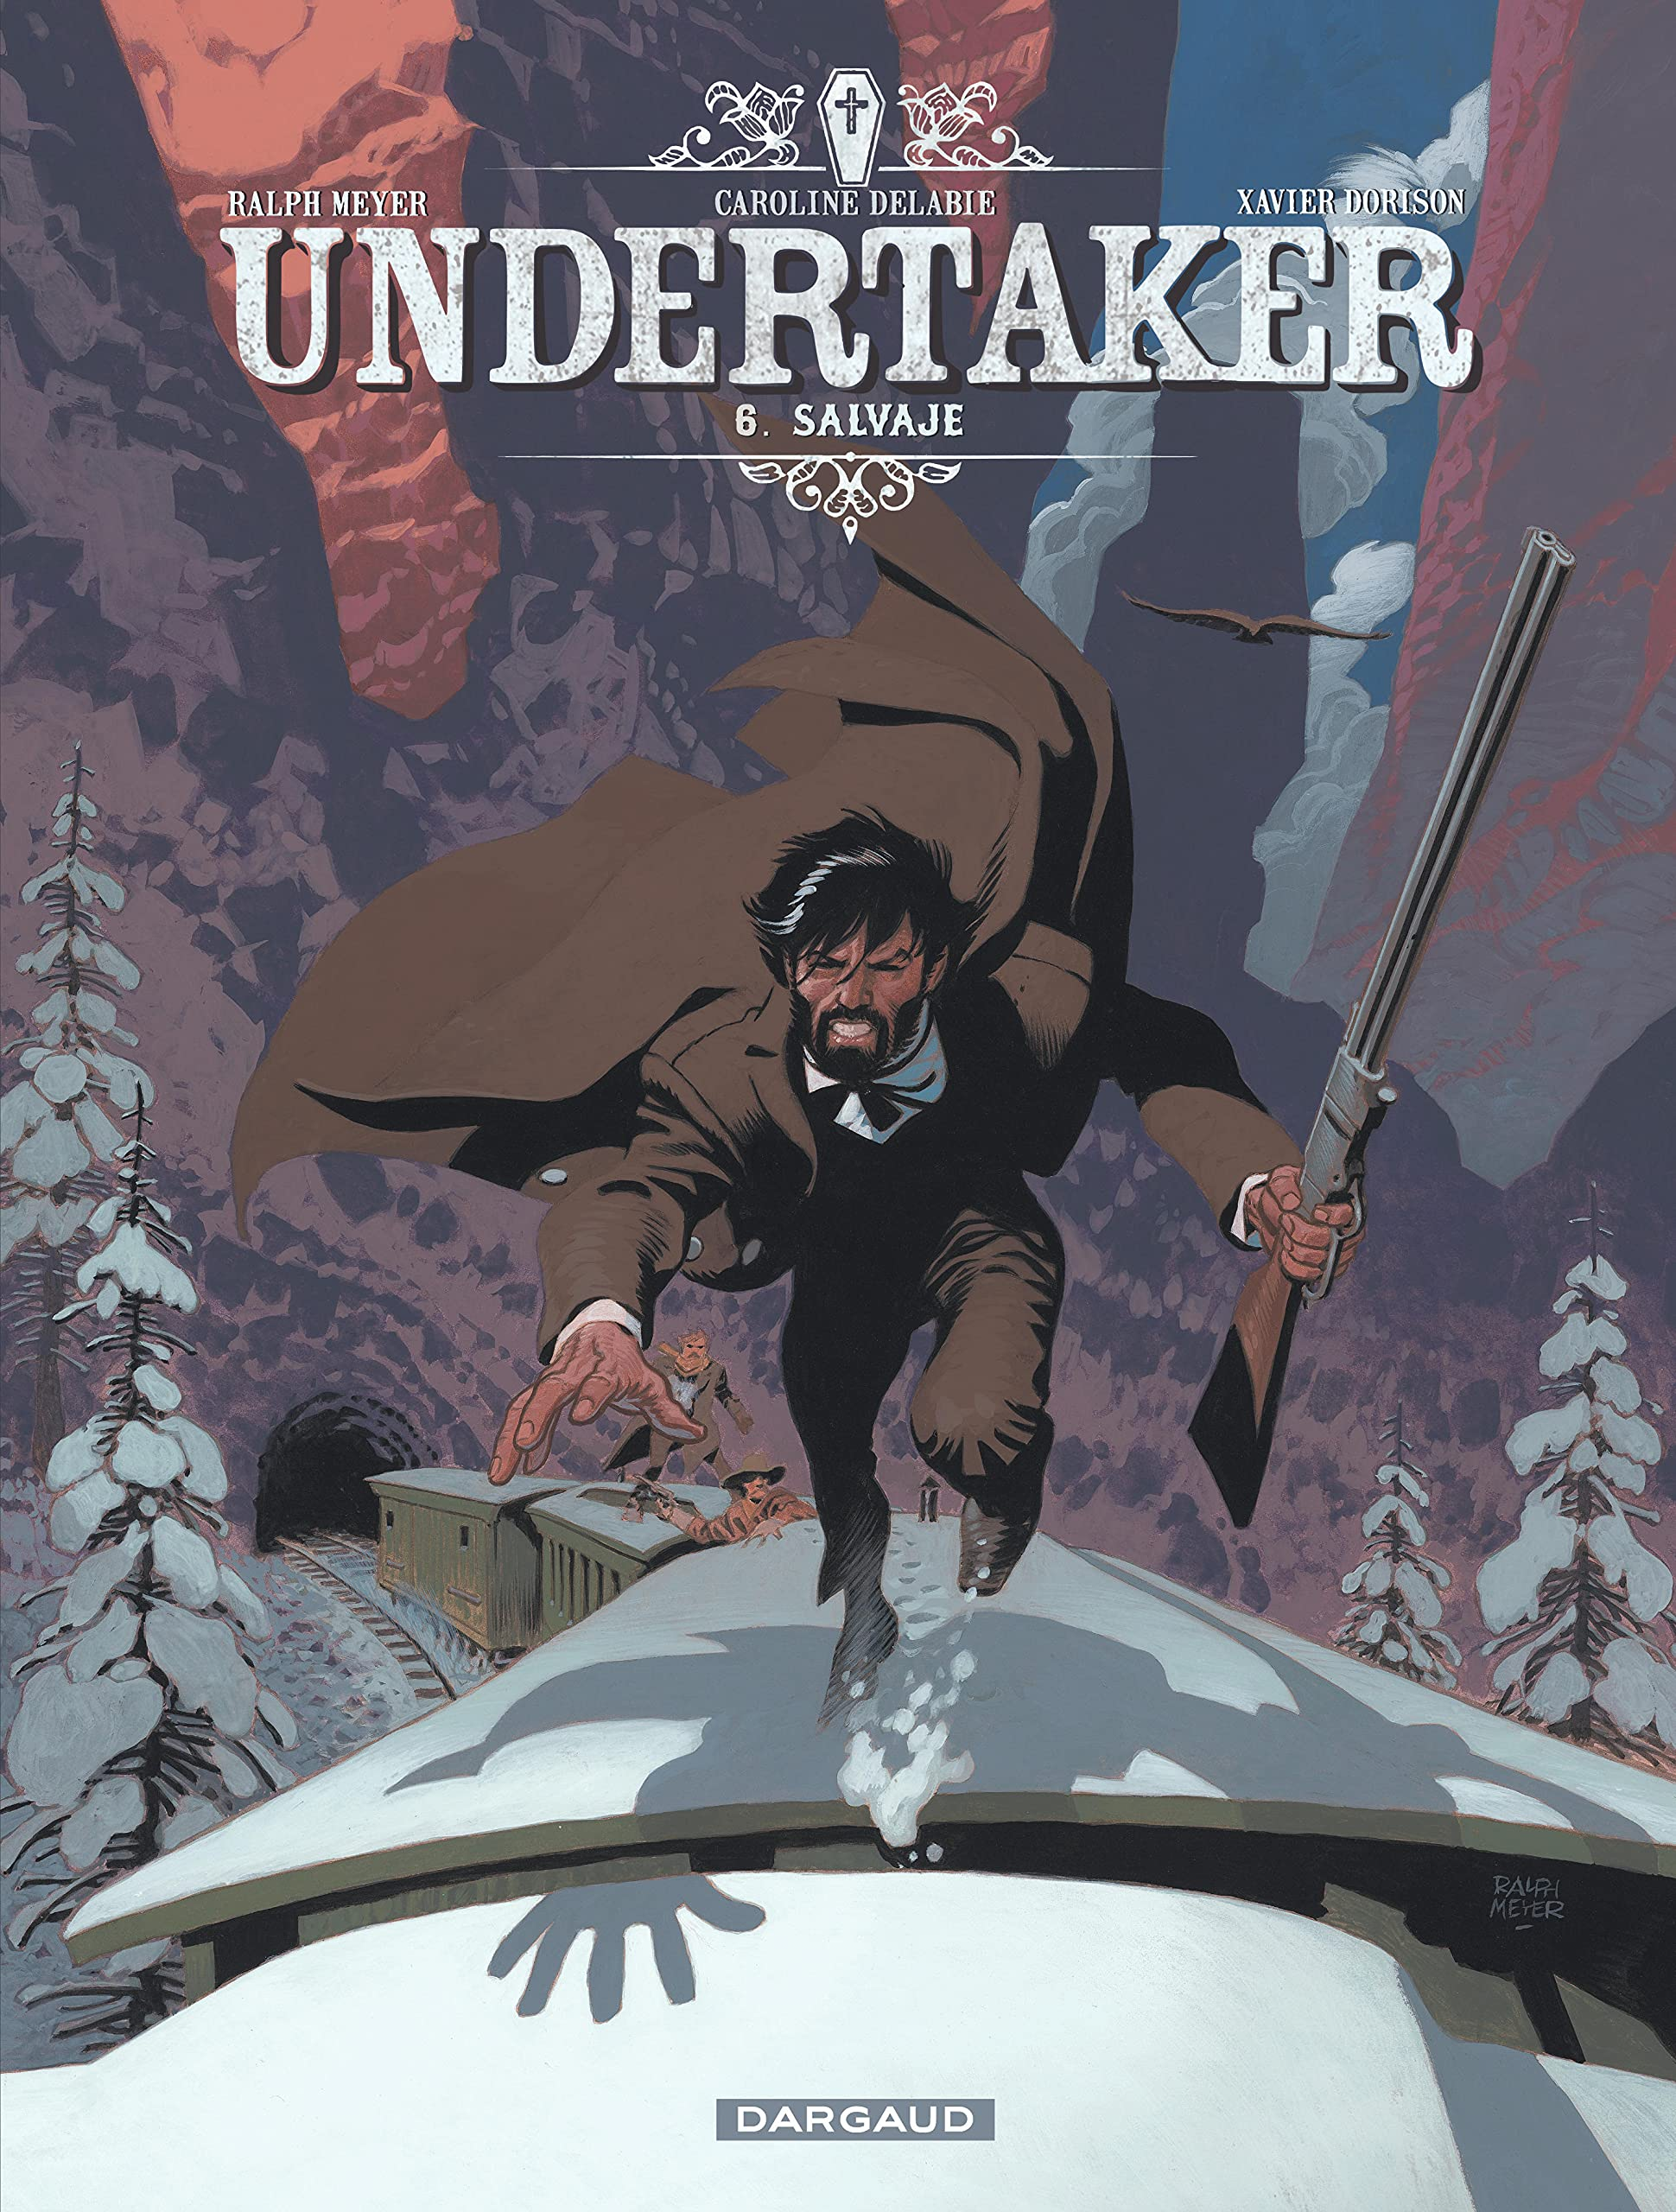 Undertaker 6 - Salvaje